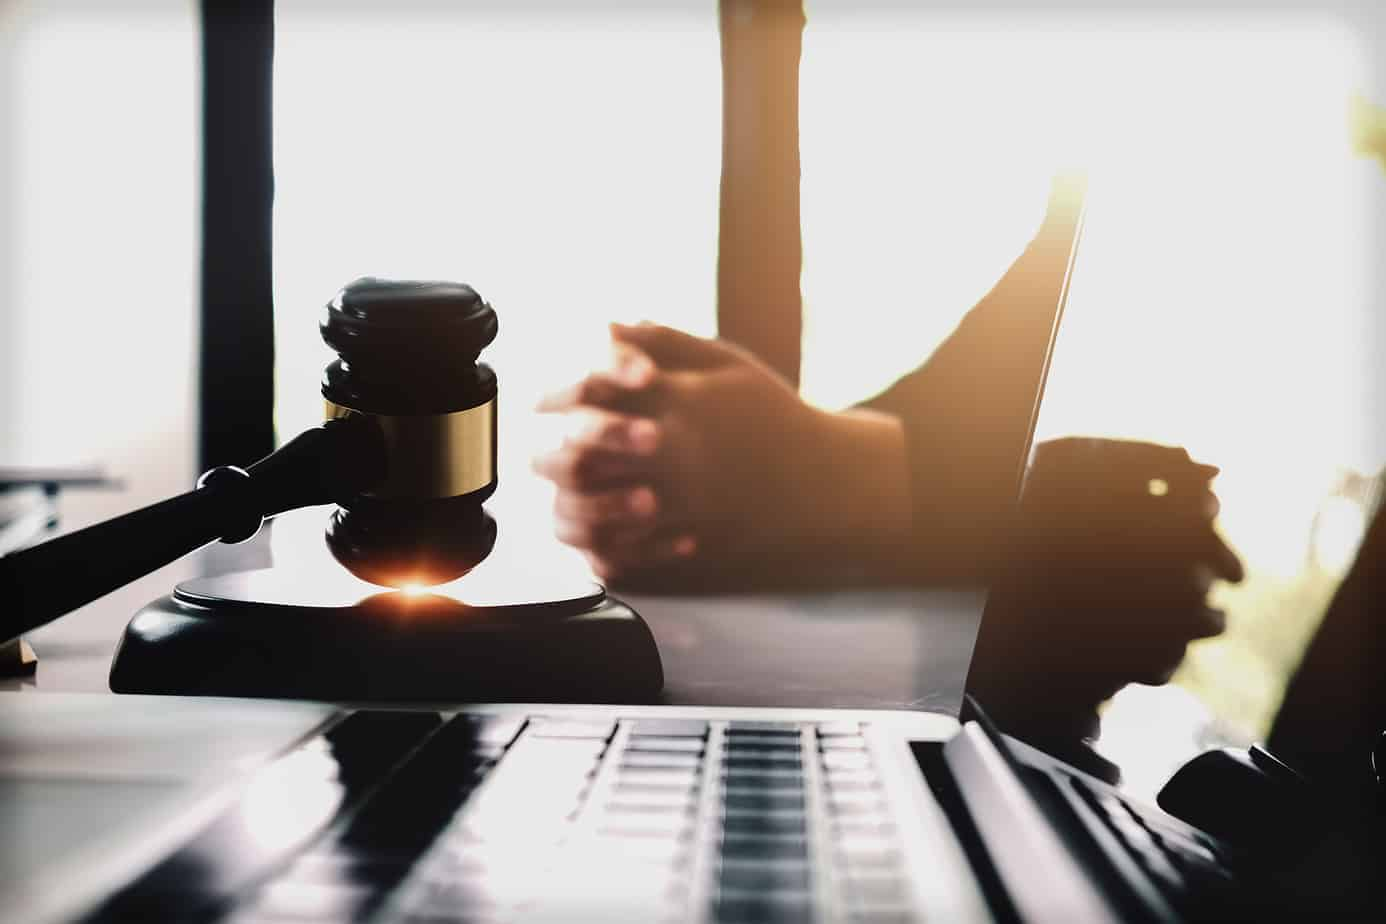 Pre-Trial Proceedings Streamlined in Bard Davol MDL • Legal Scoops